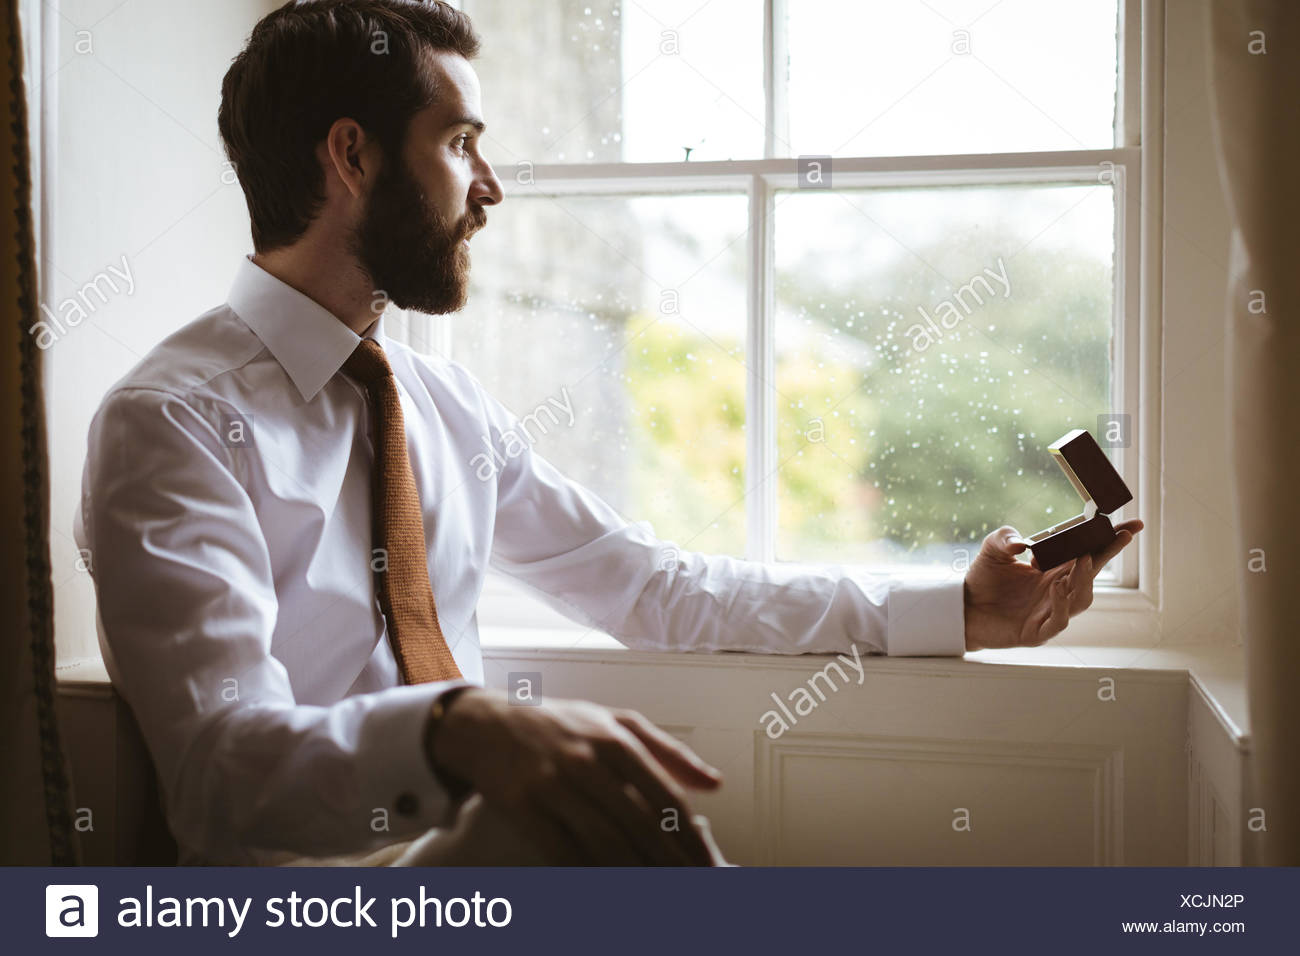 Groom sitting with ring box near window - Stock Image